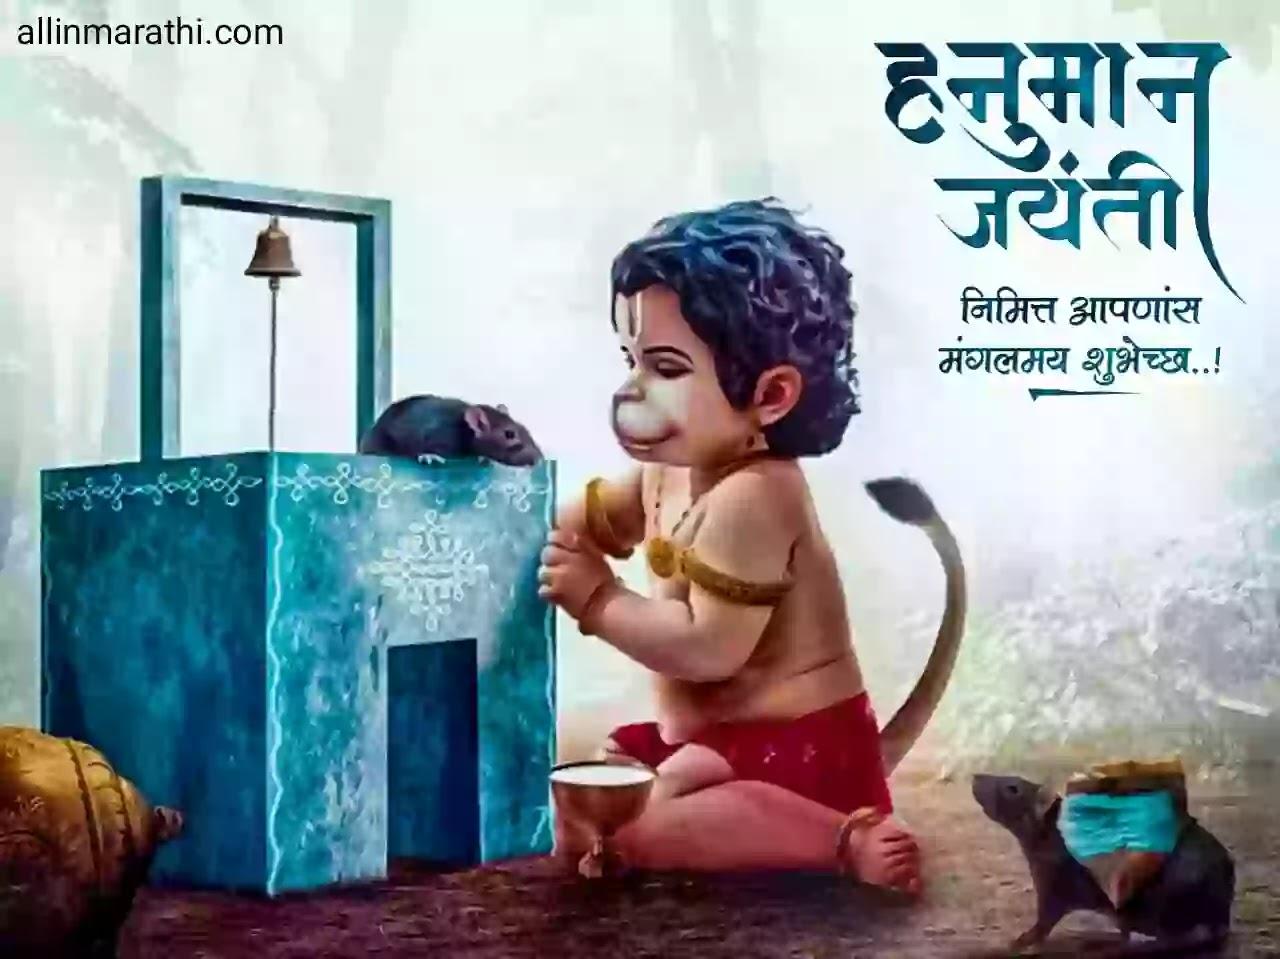 Hanuman-jayanti-greetings-marathi